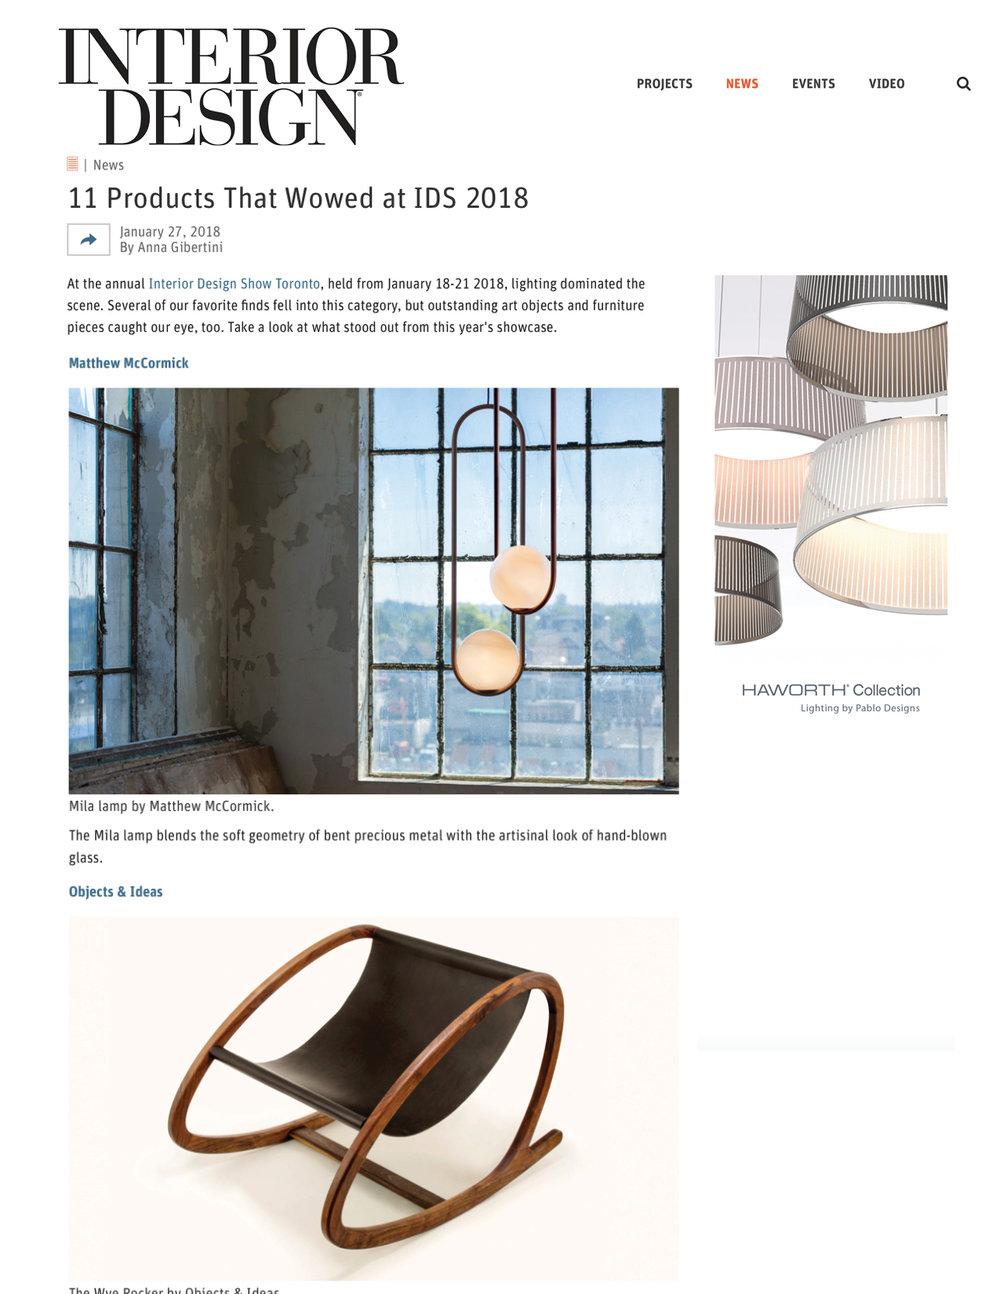 Interior Design January 27, 2018